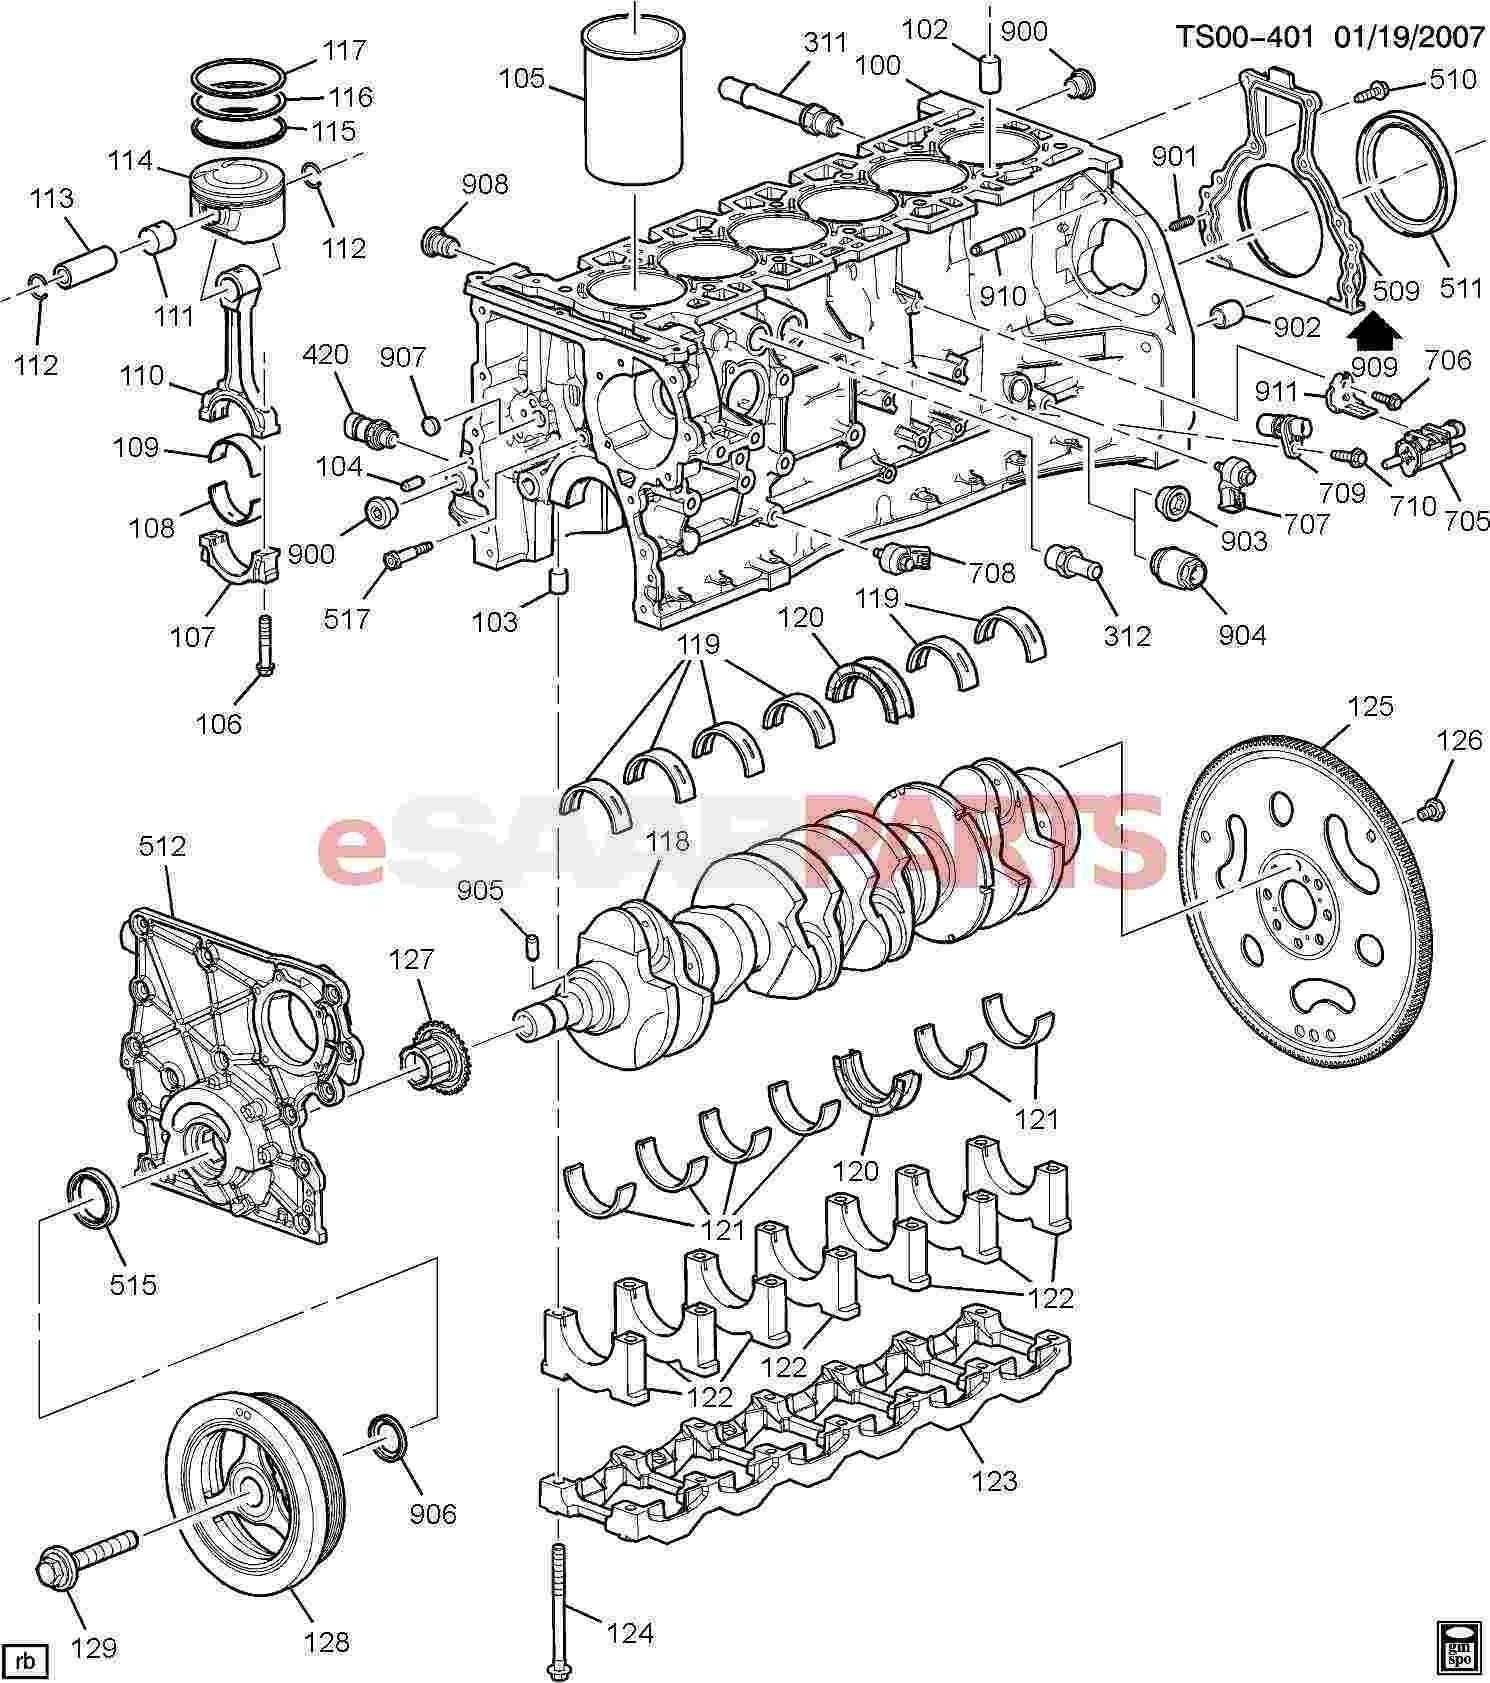 Chevy 3 1 Engine Diagram Blazer Relay Wiring Diagram Inspirationa 2003 Chevy  Blazer Engine Of Chevy